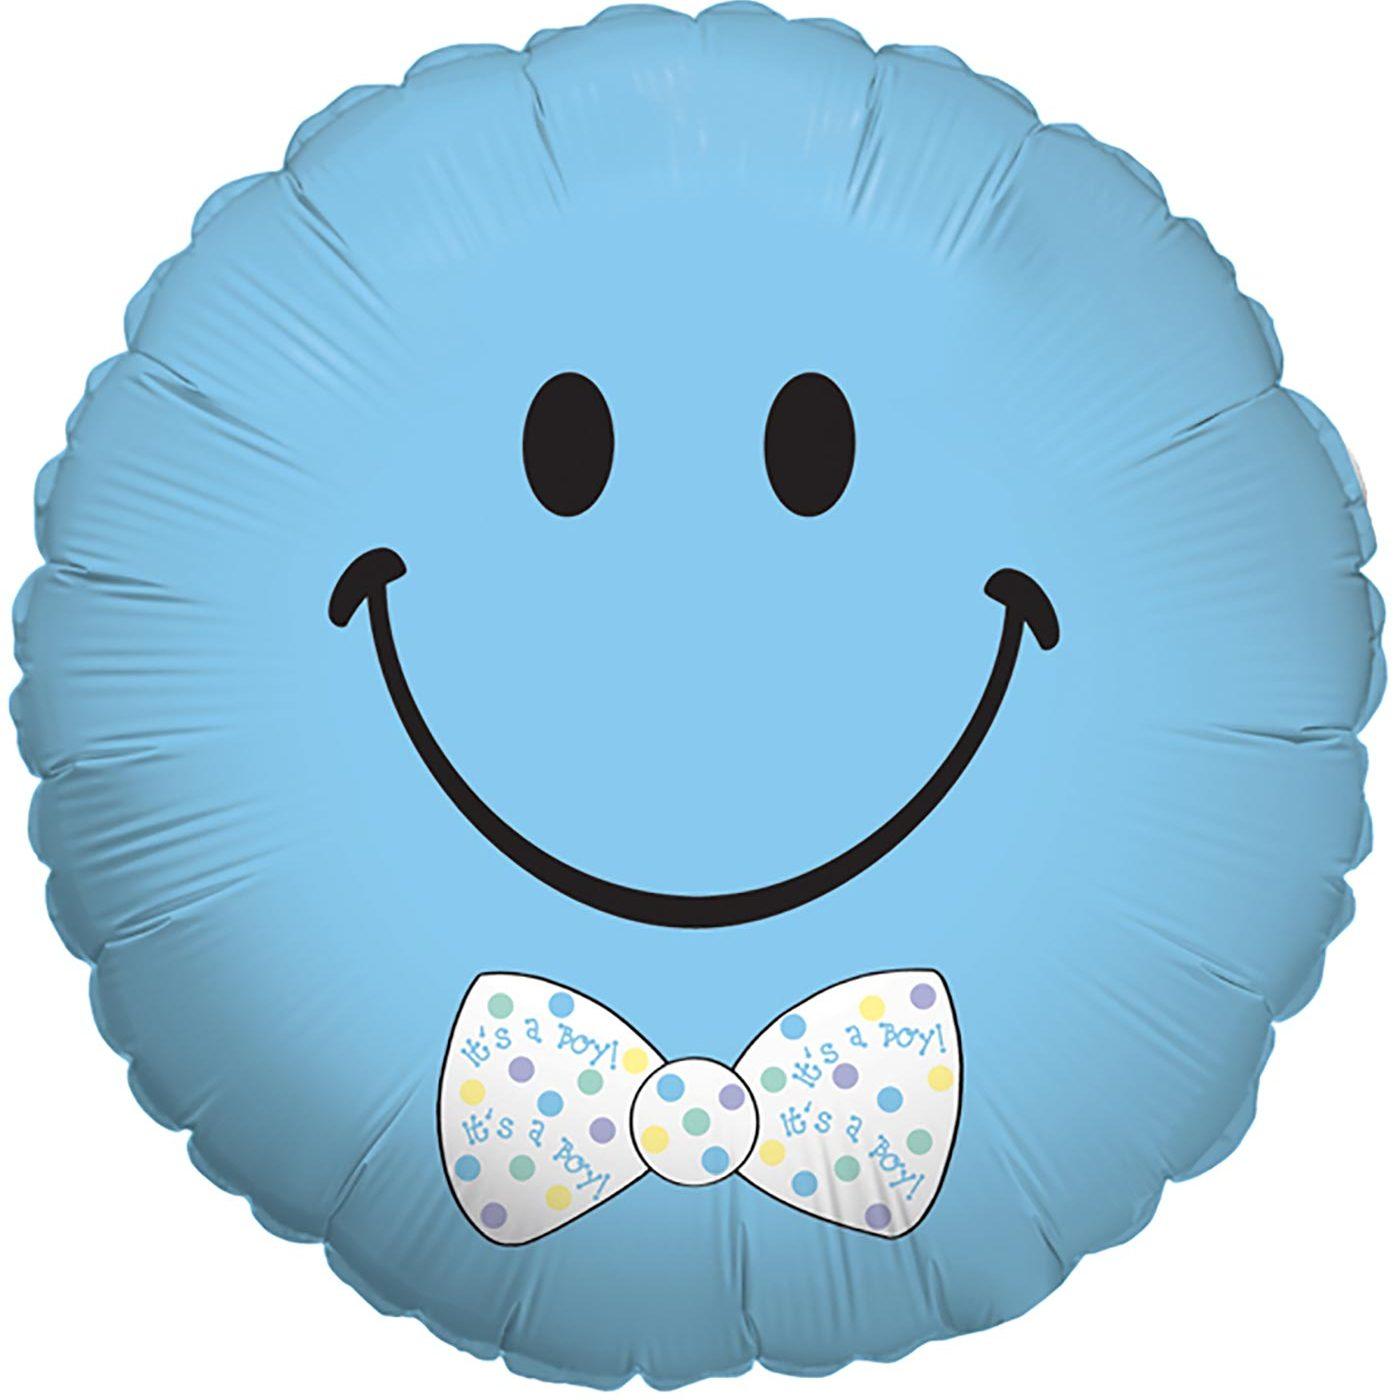 "Betallic 18"" Smiley Baby Boy"